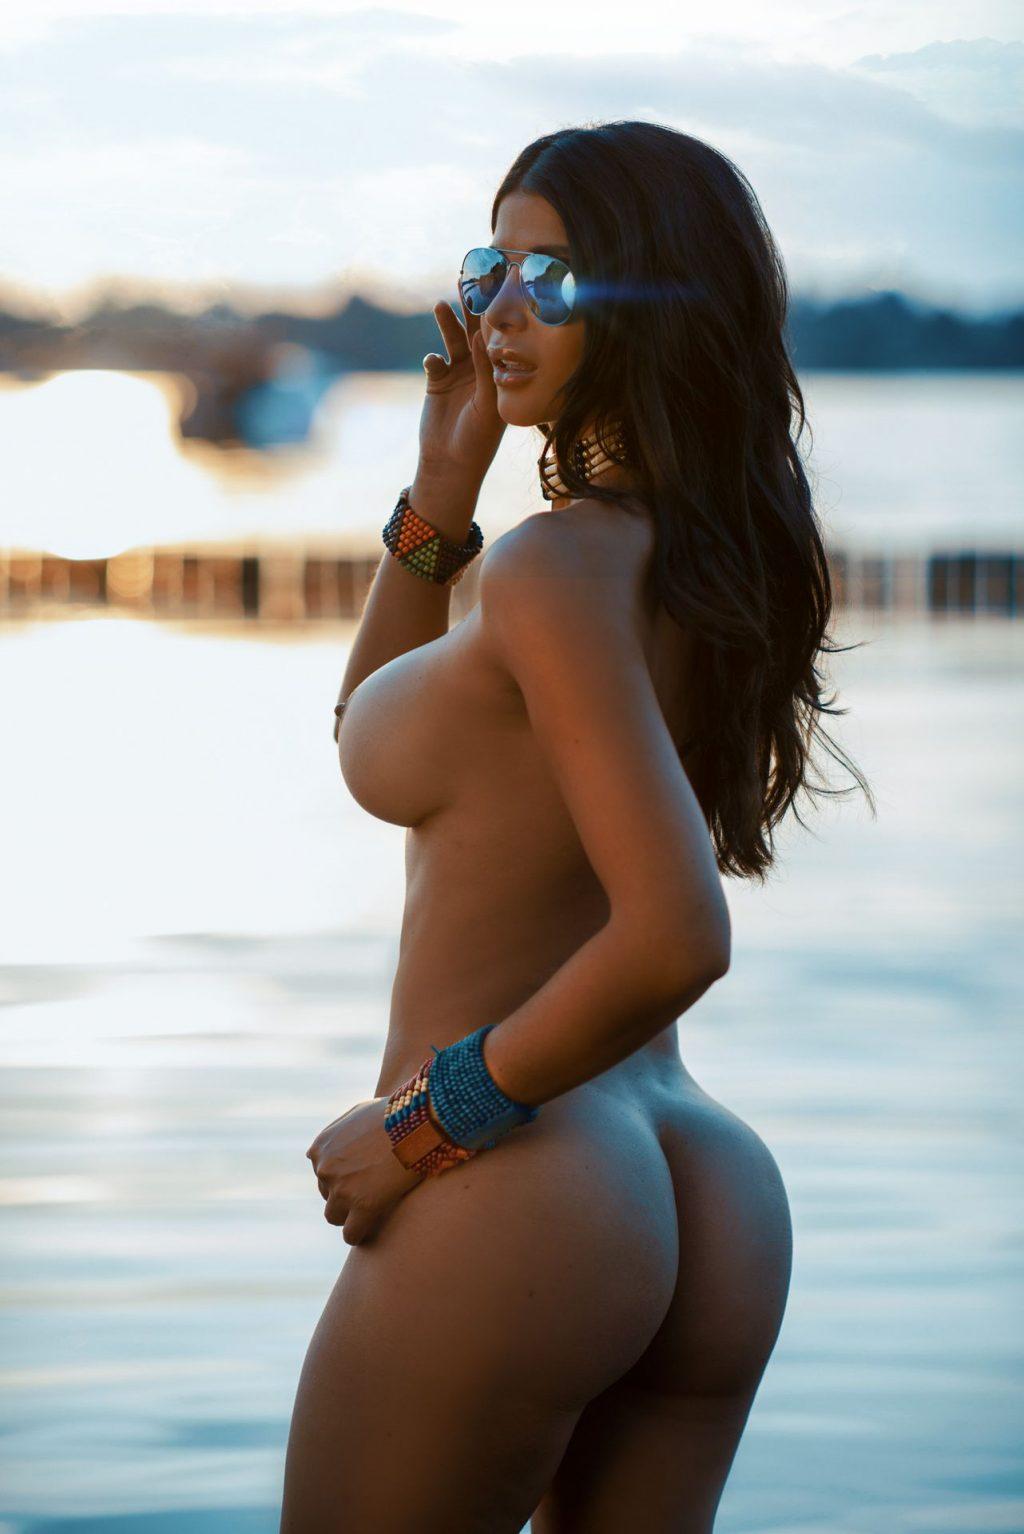 Micaela Schäfer Nude & Sexy (21 Photos)